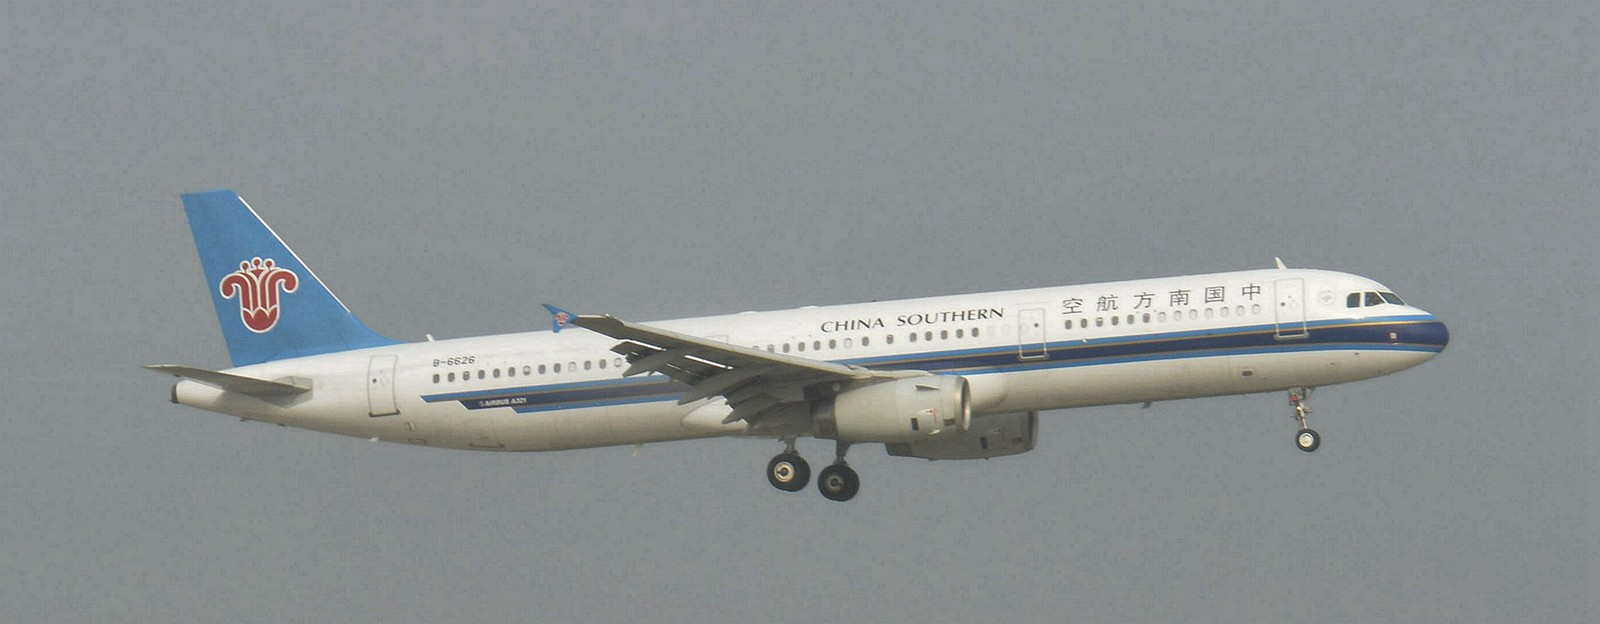 Re:[原创]第一次好好拍机,画质就别想了。。 AIRBUS A321-200 B-6626 中国重庆江北国际机场